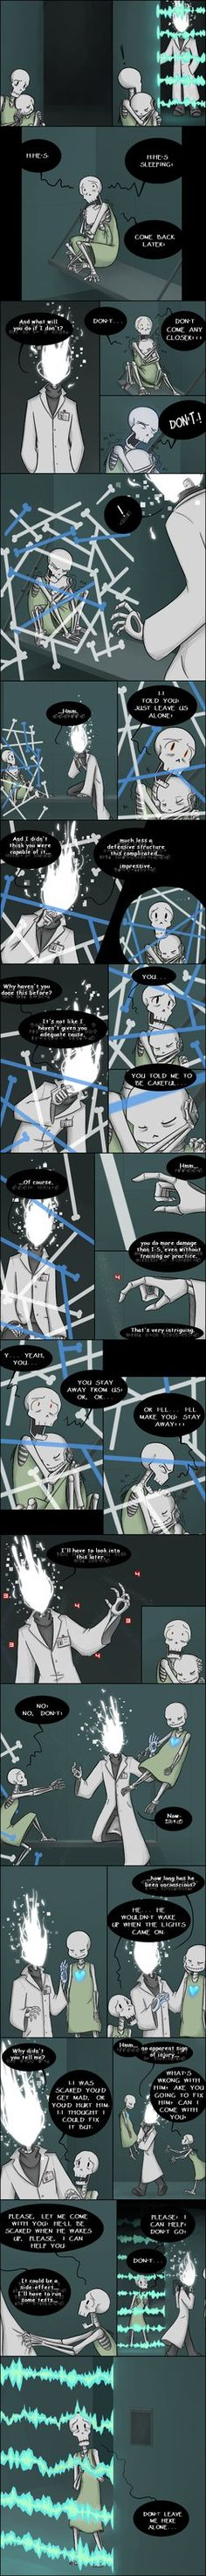 I'm not crying I swear I'll cut you by zarla.deviantart.com on @DeviantArt